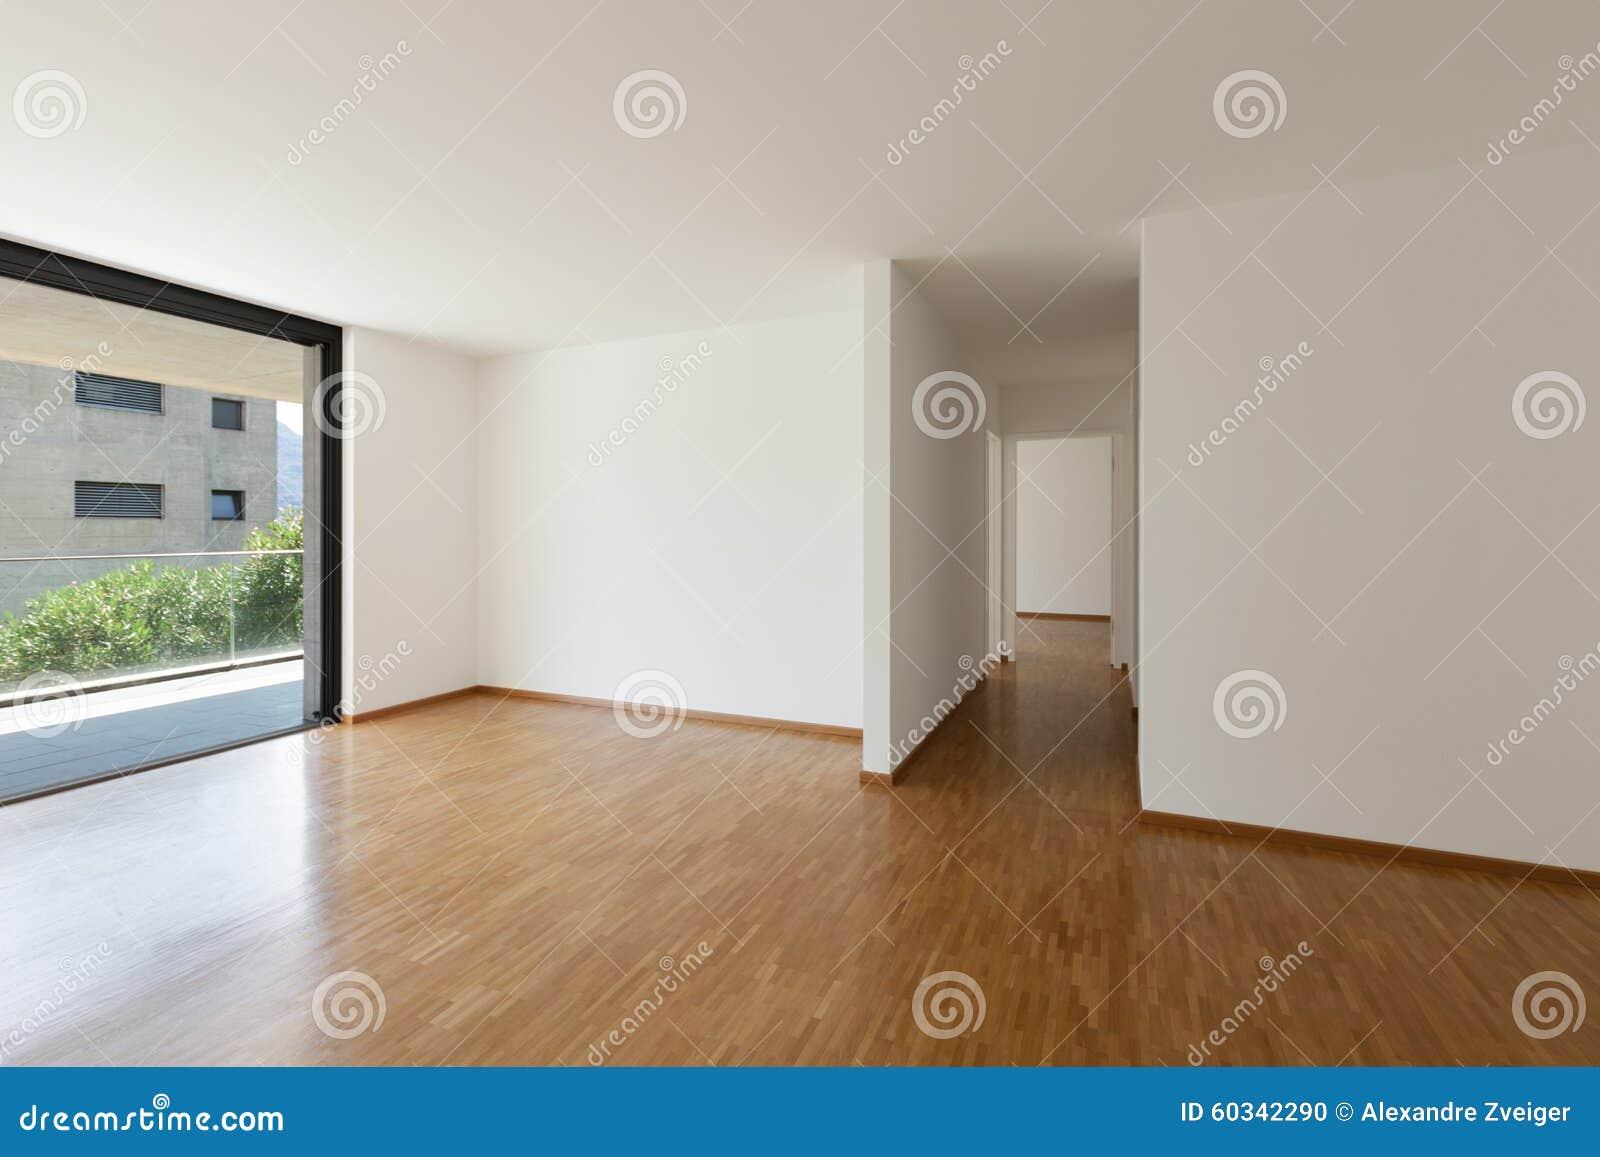 Empty living room with balcony stock photo image 60342290 for Balcony interior